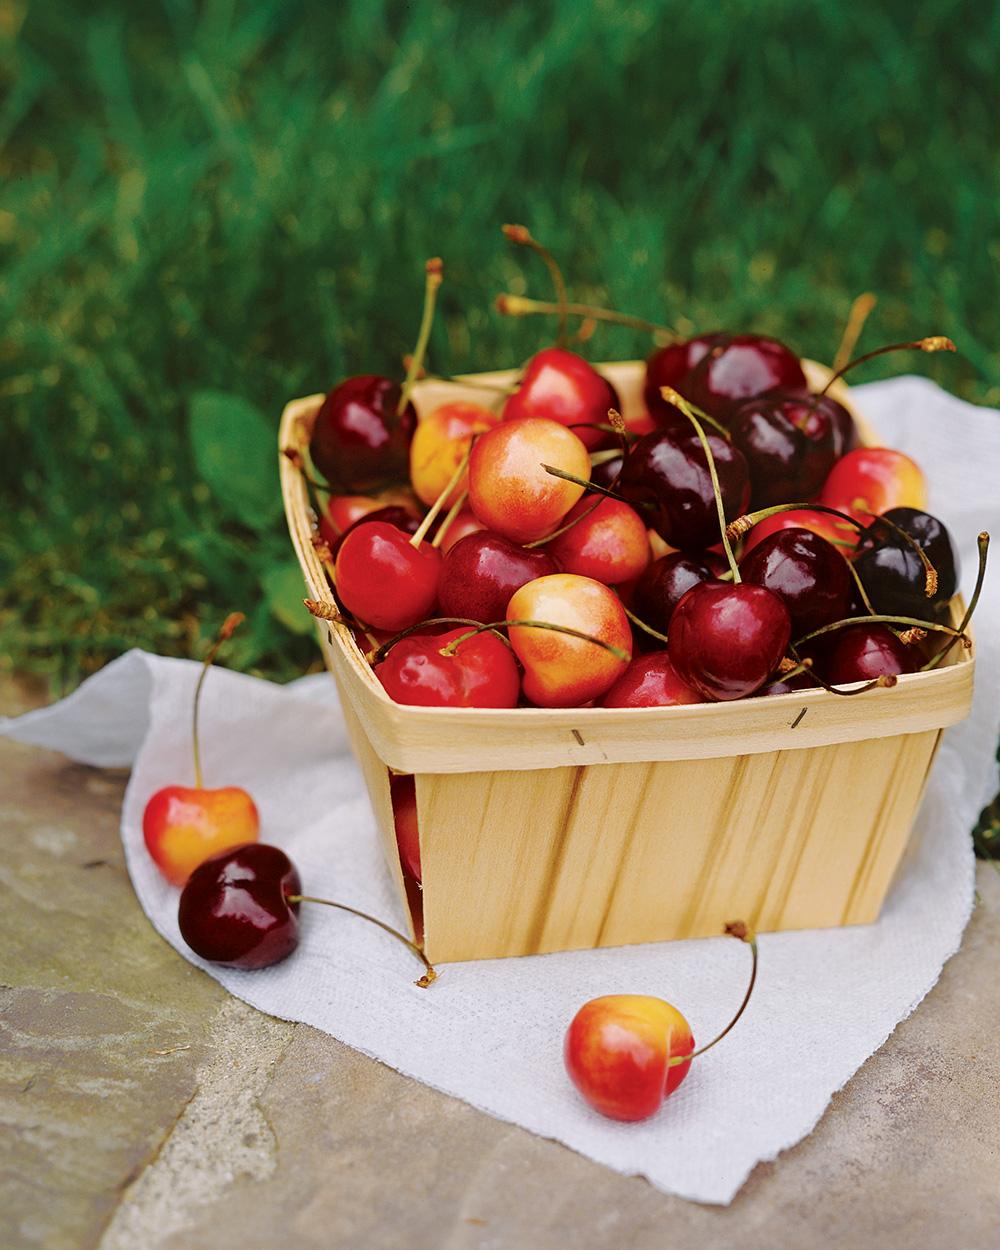 ba103366_0608_cherries.jpg